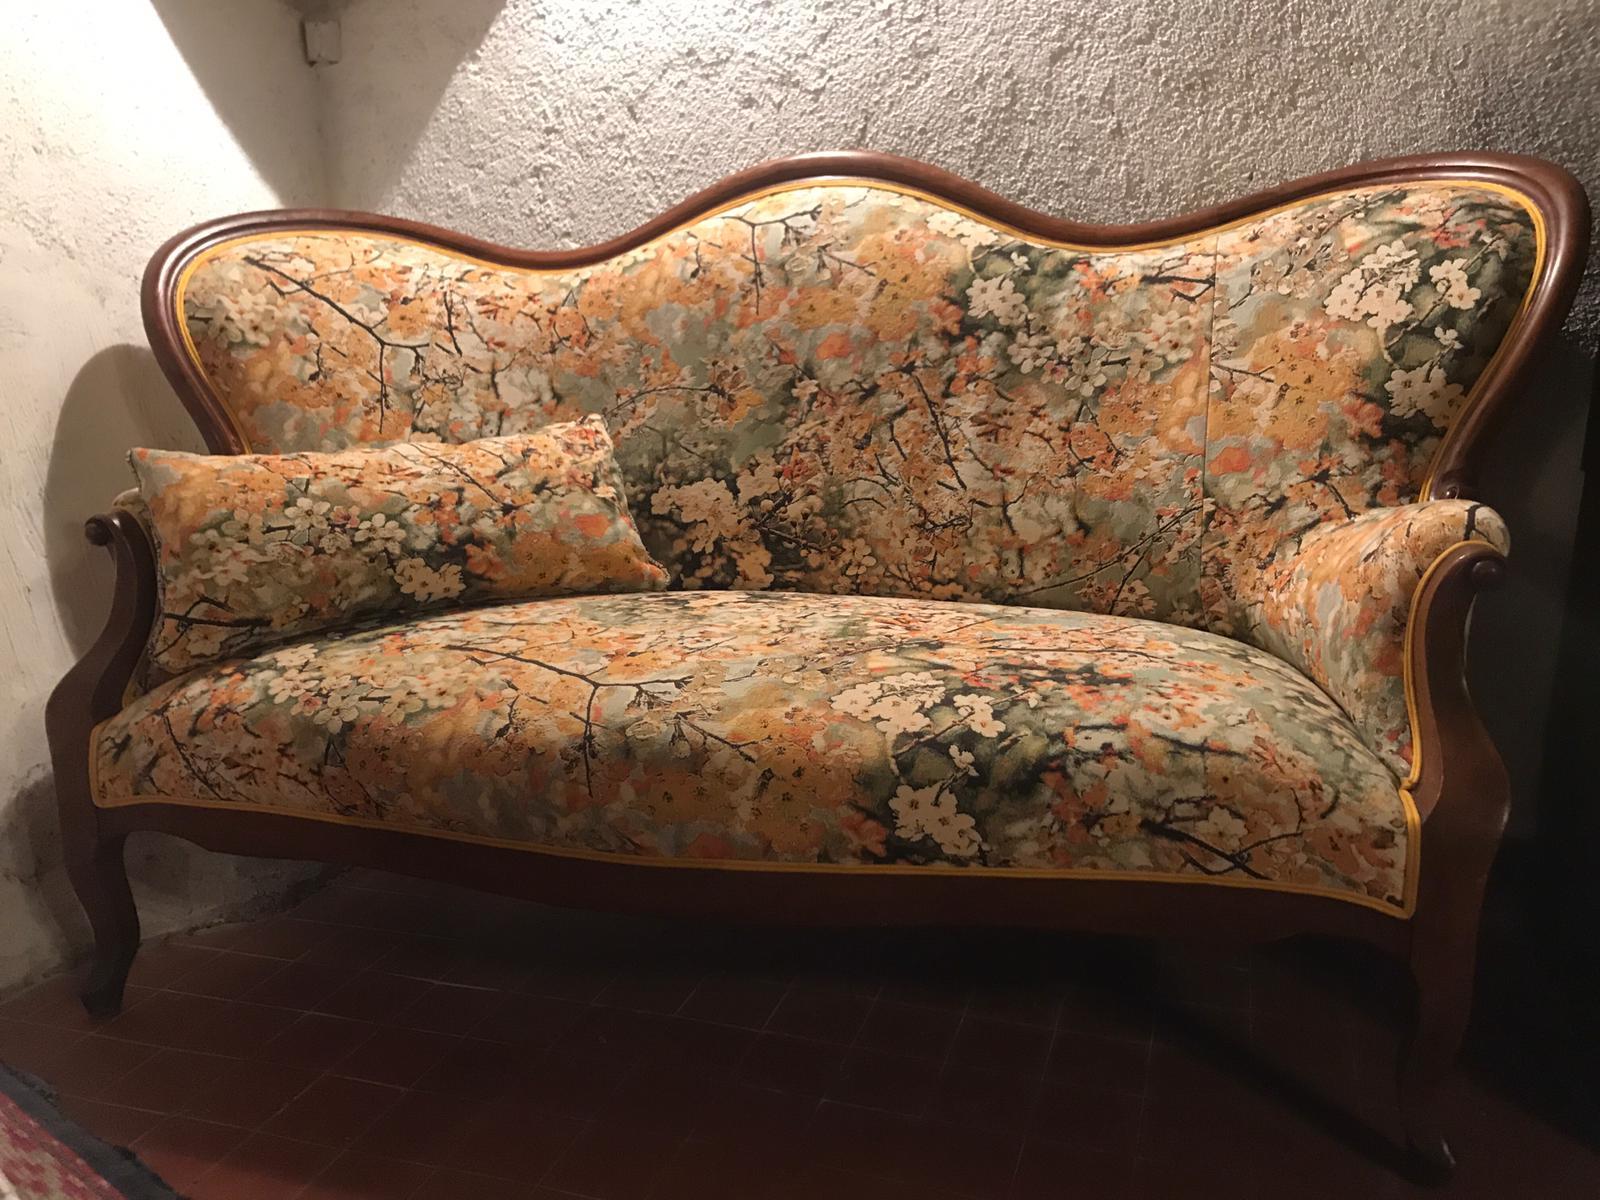 Canapé XIXeme - Choix d'un tissu floral